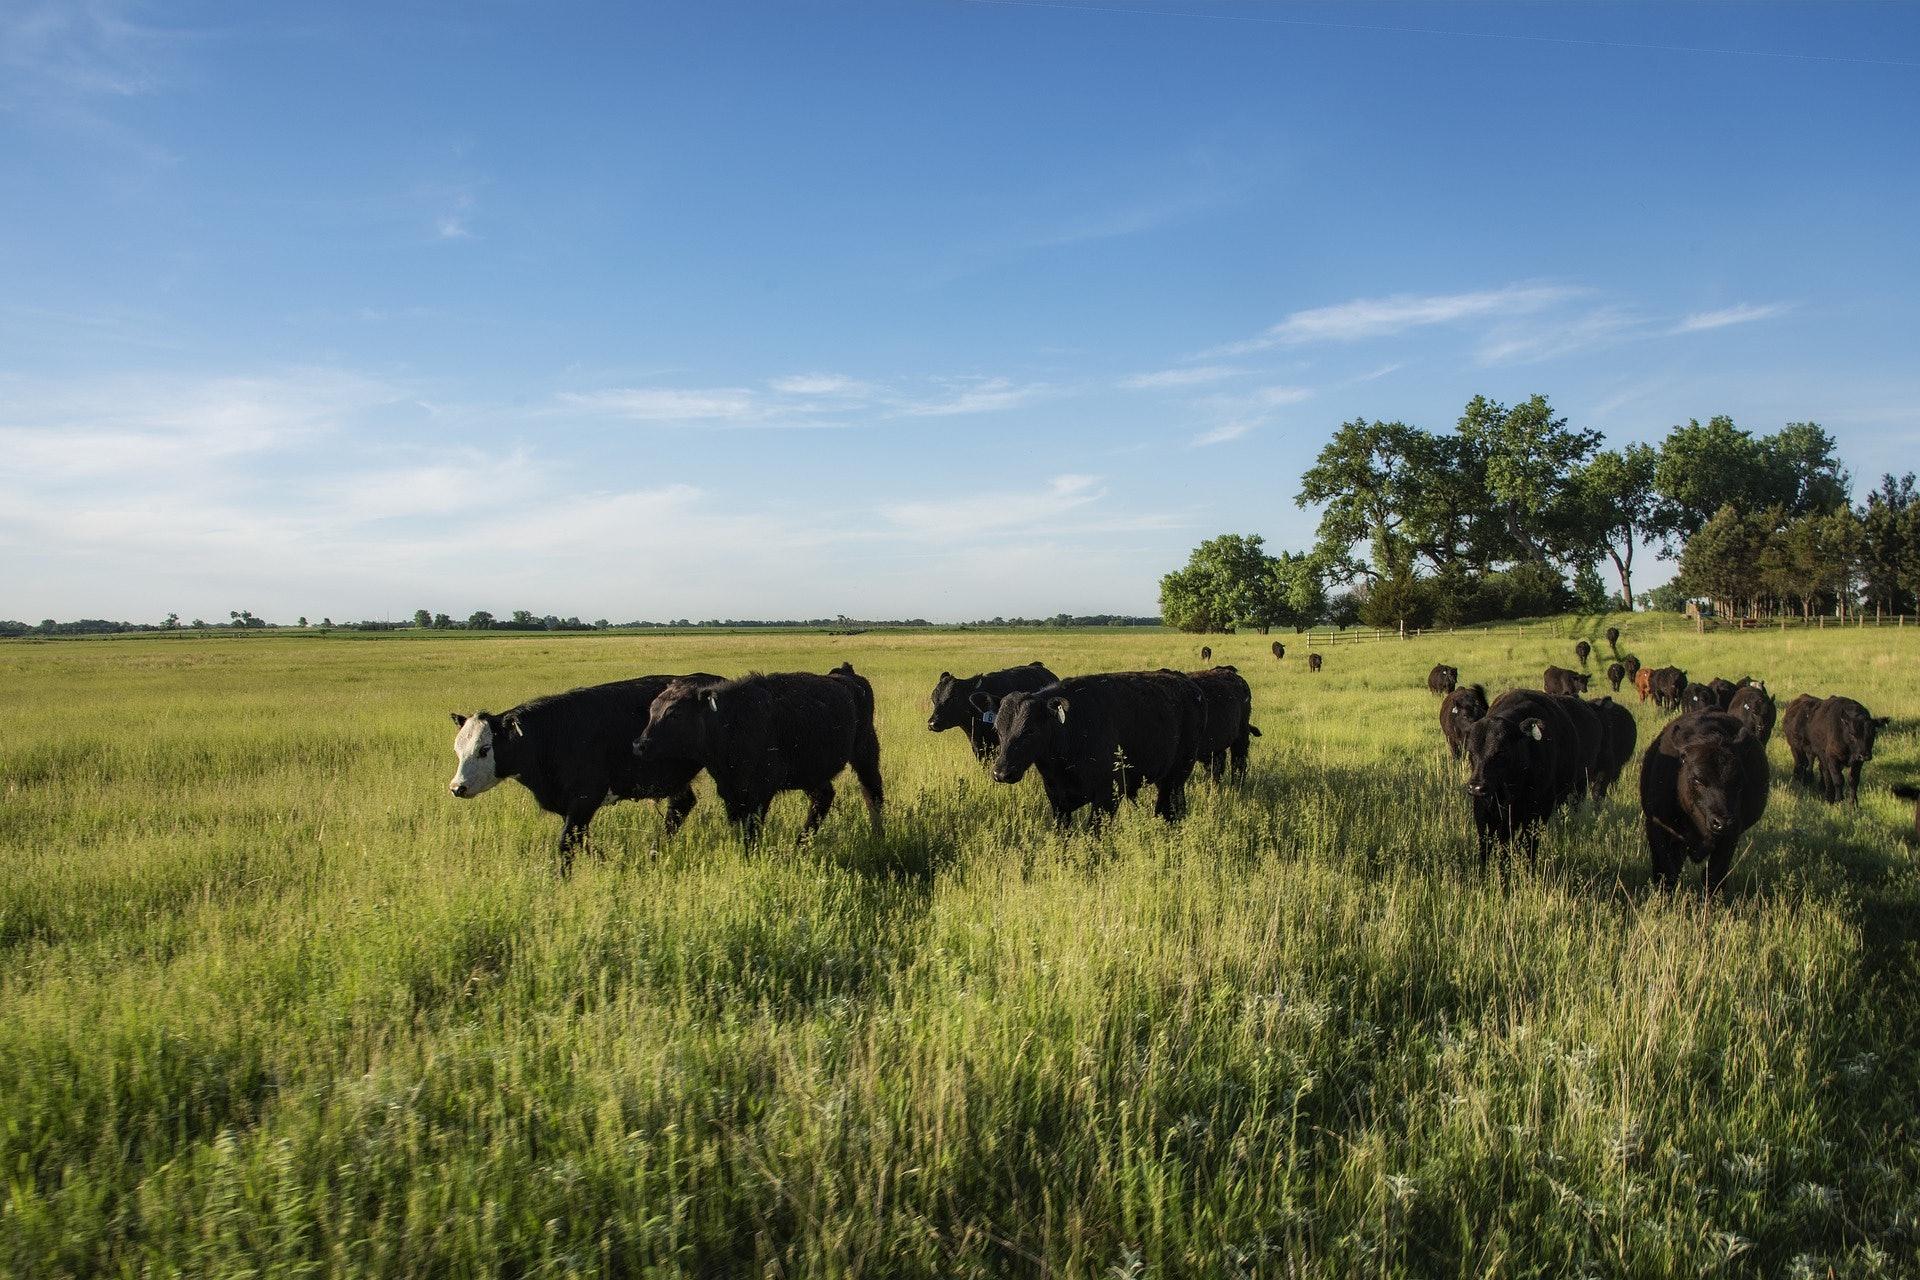 cows grass-fed